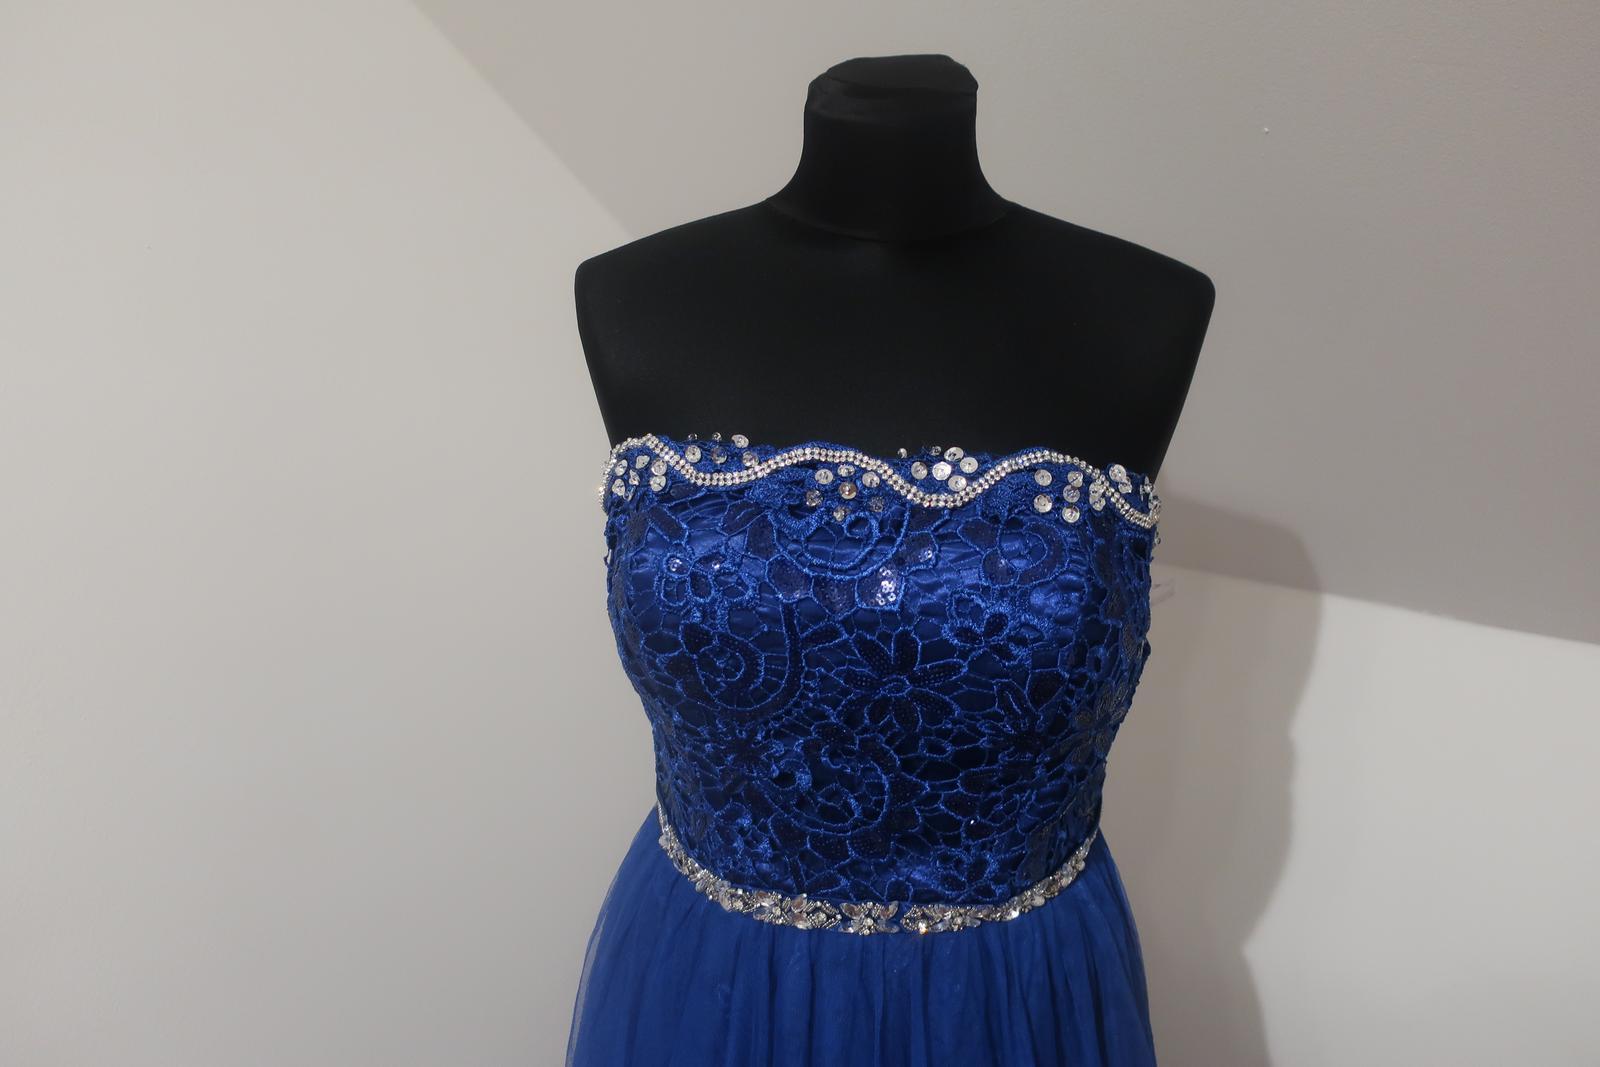 Dlhé modré šaty - Obrázok č. 2